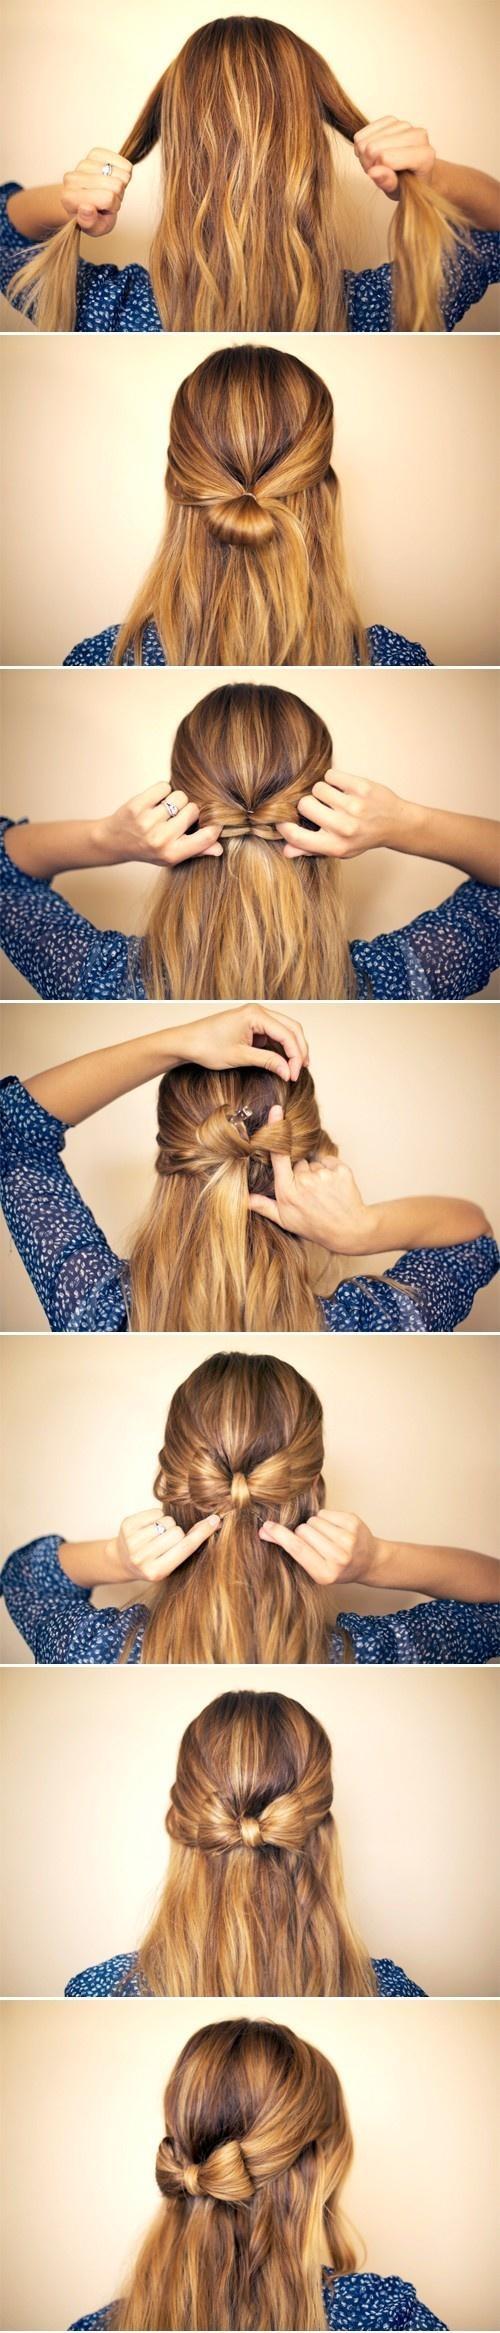 Nattha Pinsuwan: Hair Accessory | A Bow Updo #Lockerz